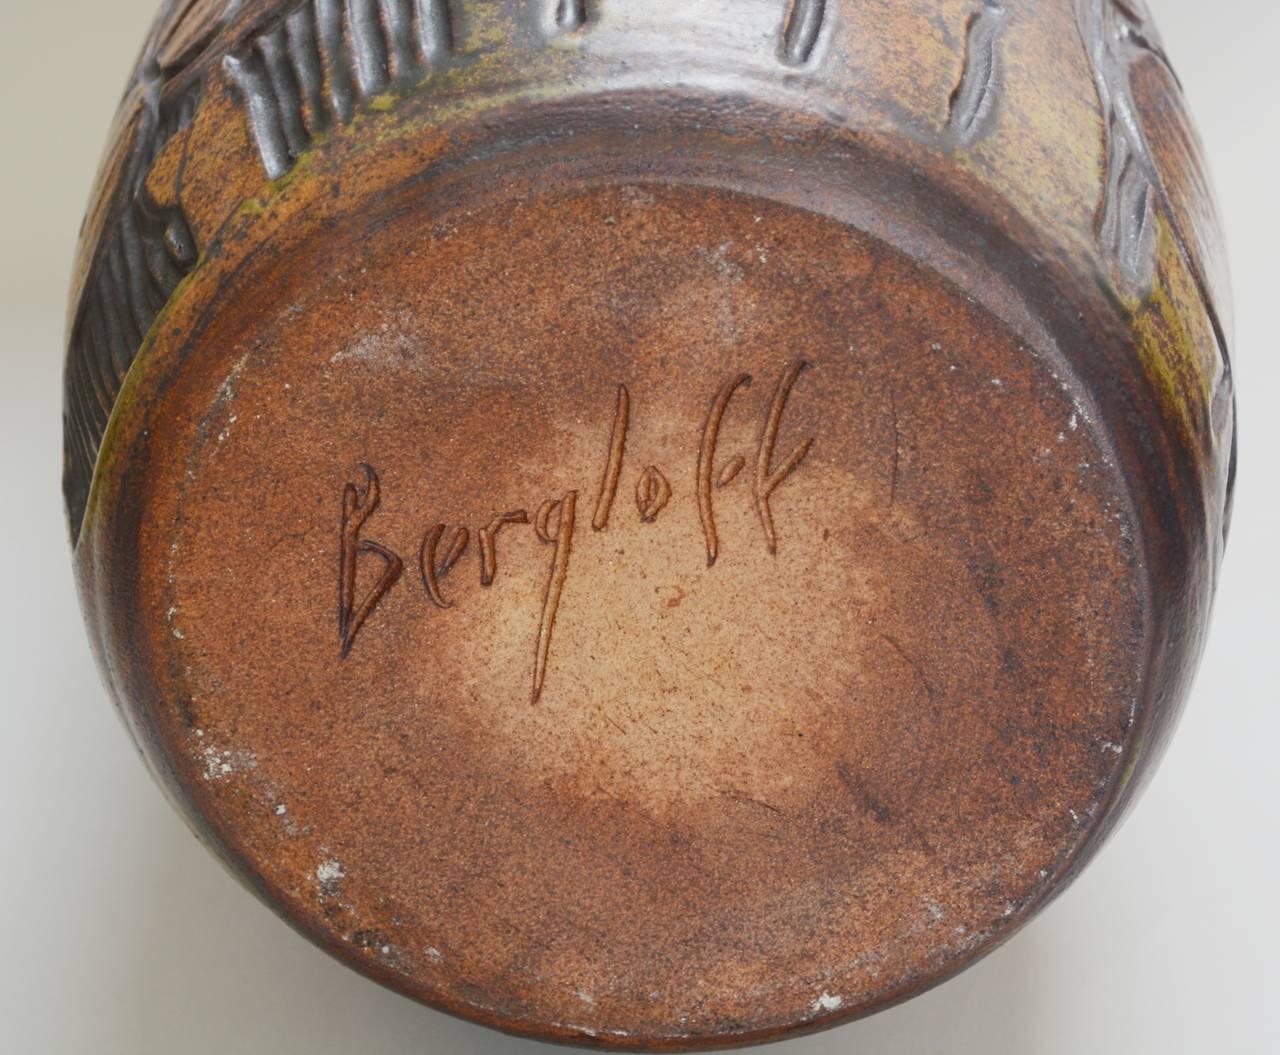 Monumental Andrew Bergloff Studio Pottery Floor Vase For Sale 2